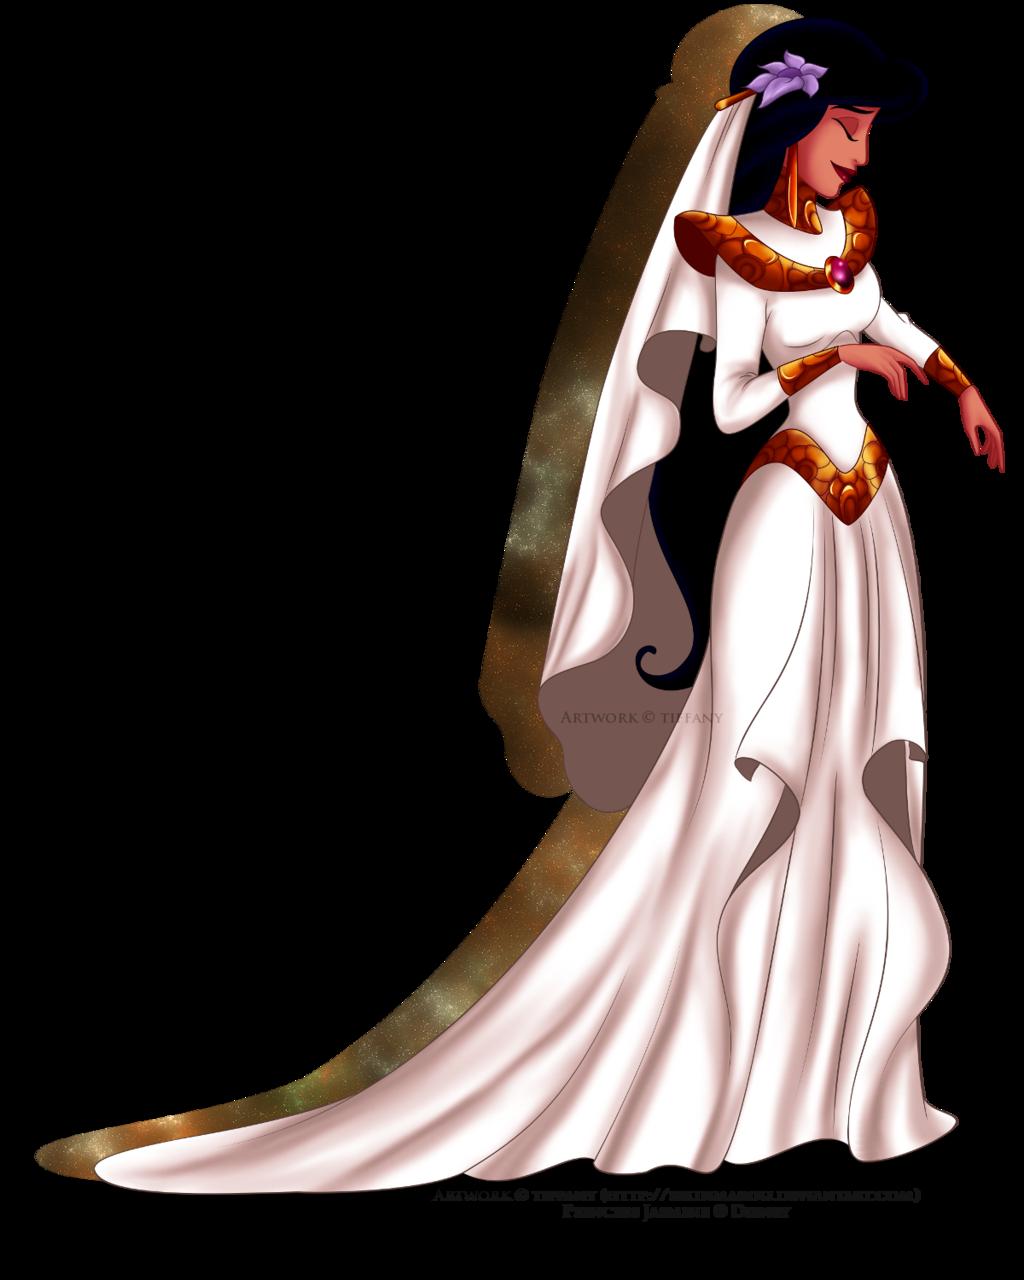 Princess Jasmine Wedding Day Princess Jasmine Wedding Disney Princess Wedding Princess Jasmine Picture [ 1280 x 1024 Pixel ]